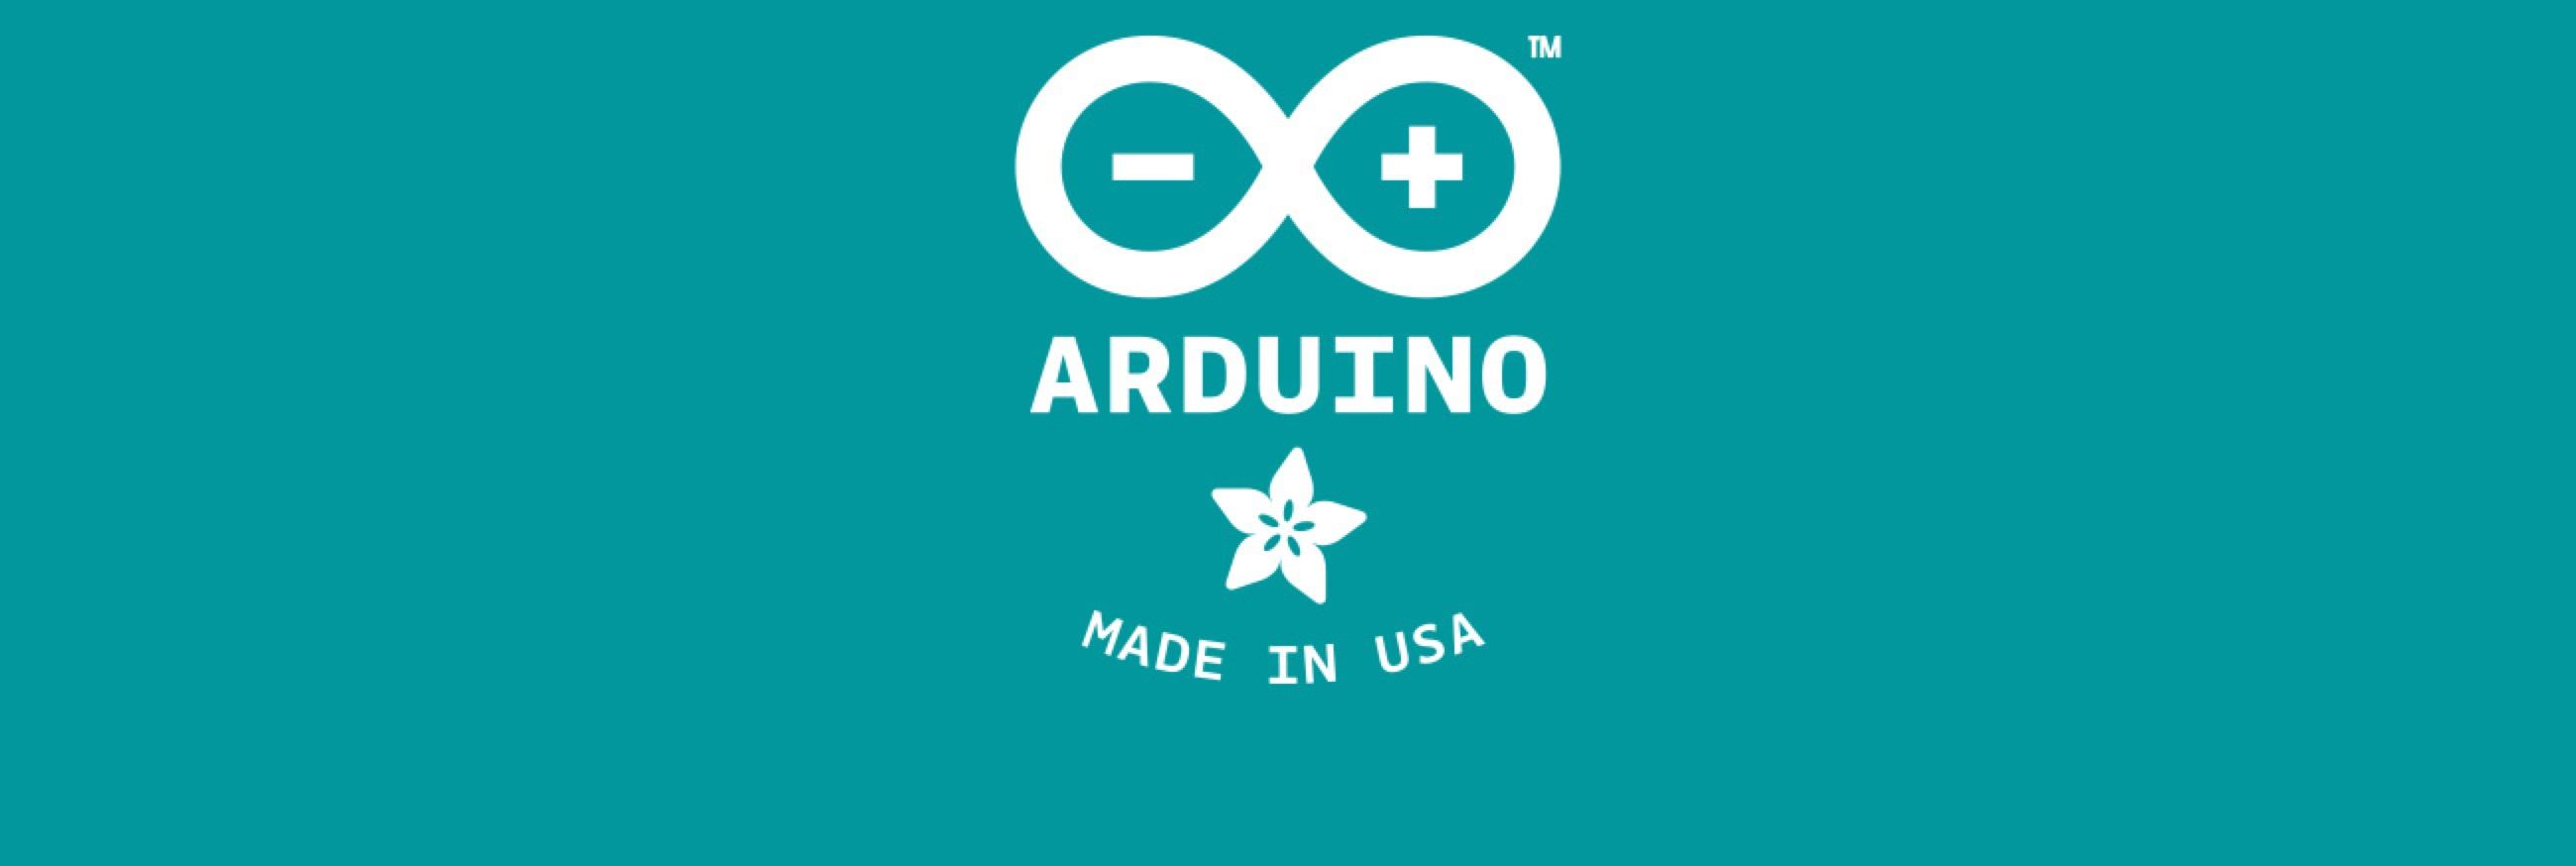 Arduinobloghero